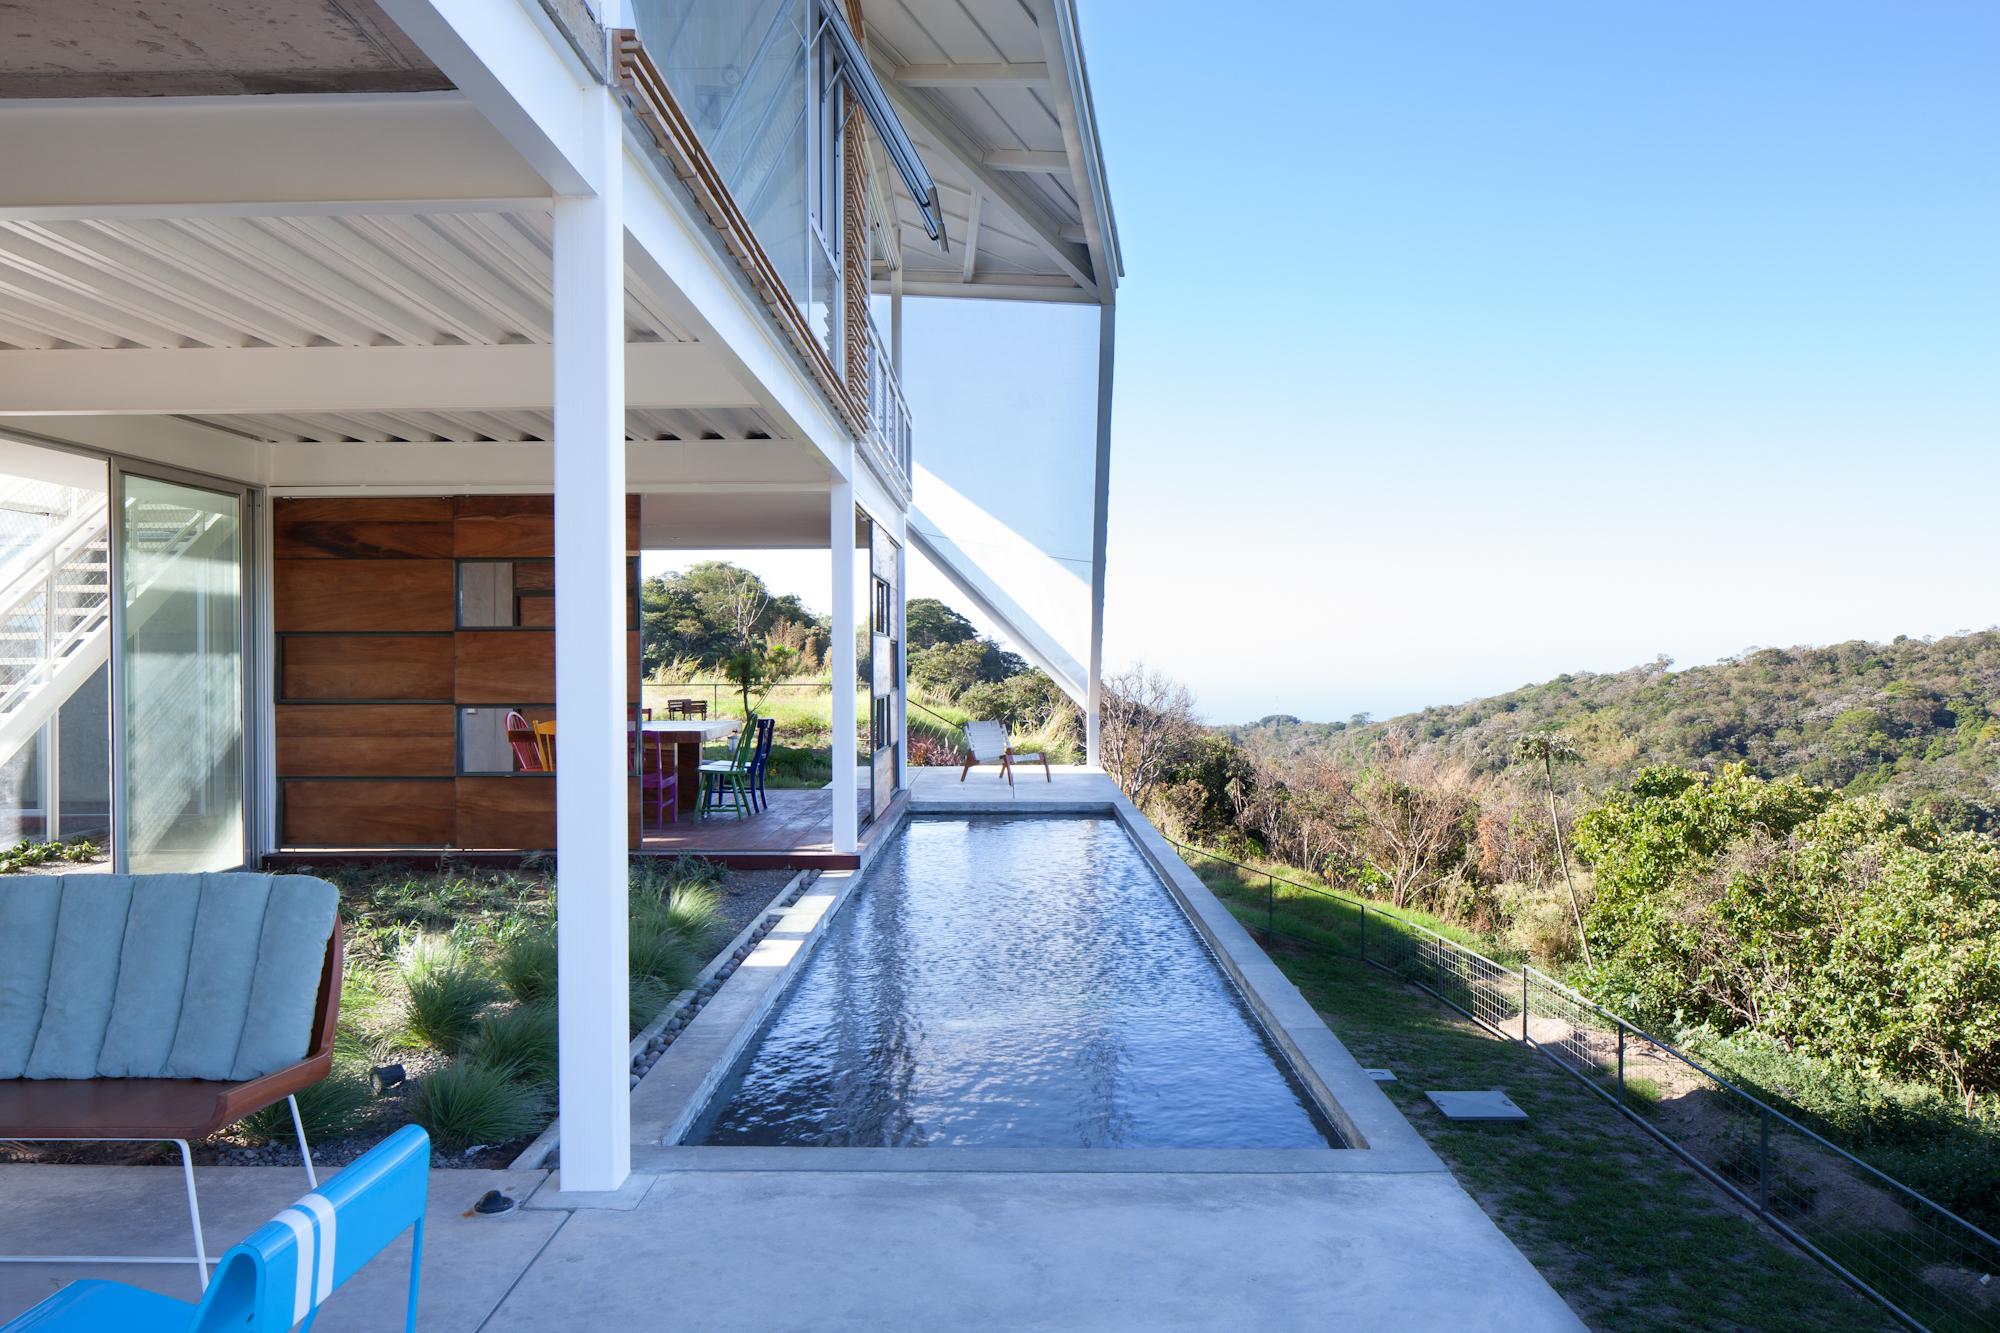 Piso Casa Piscucha_3